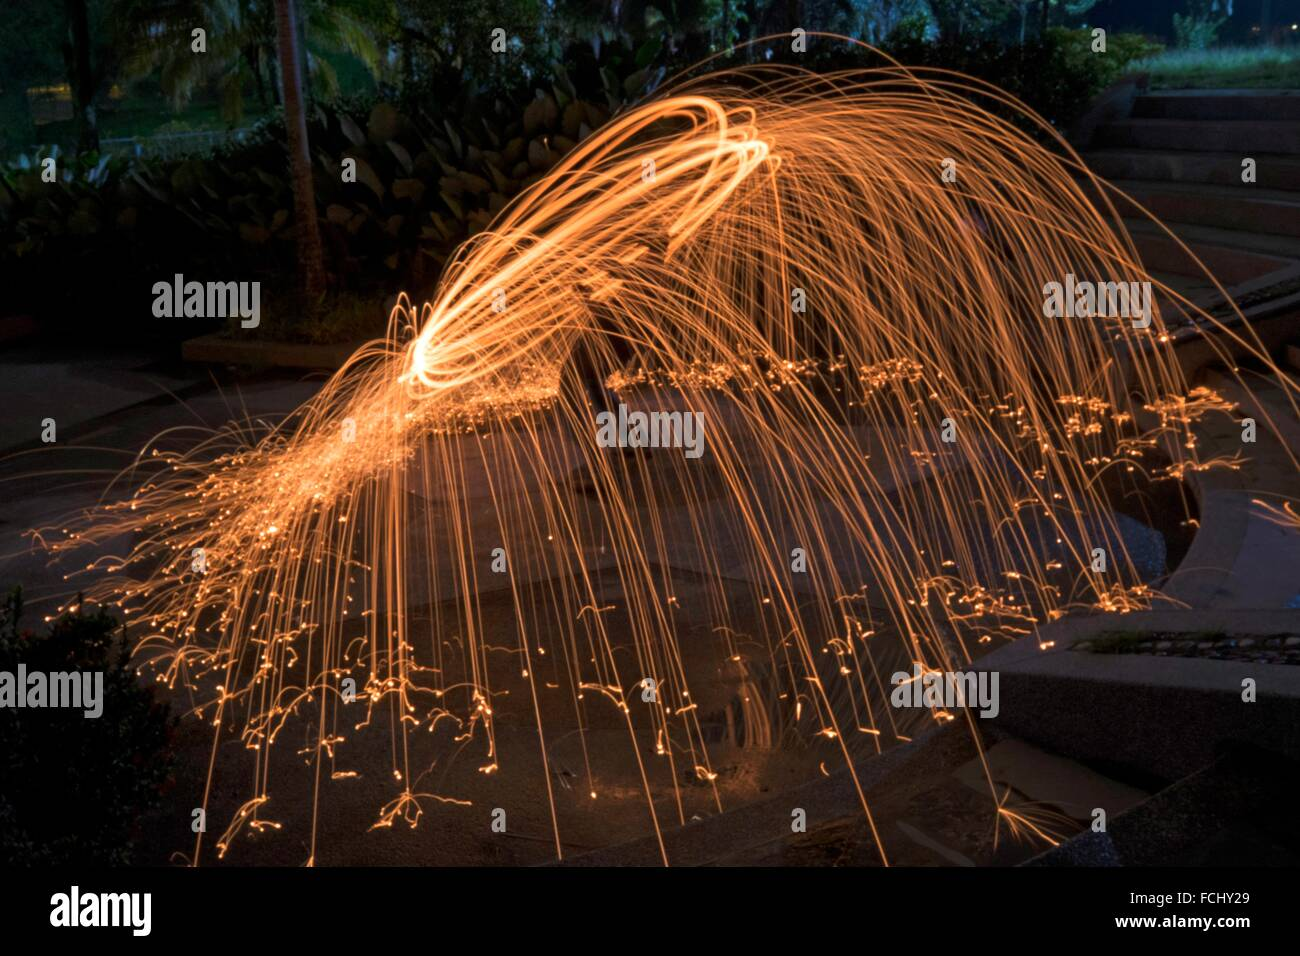 Steel wool spinning, Kuala Lumpur, Malaysia. Stock Photo